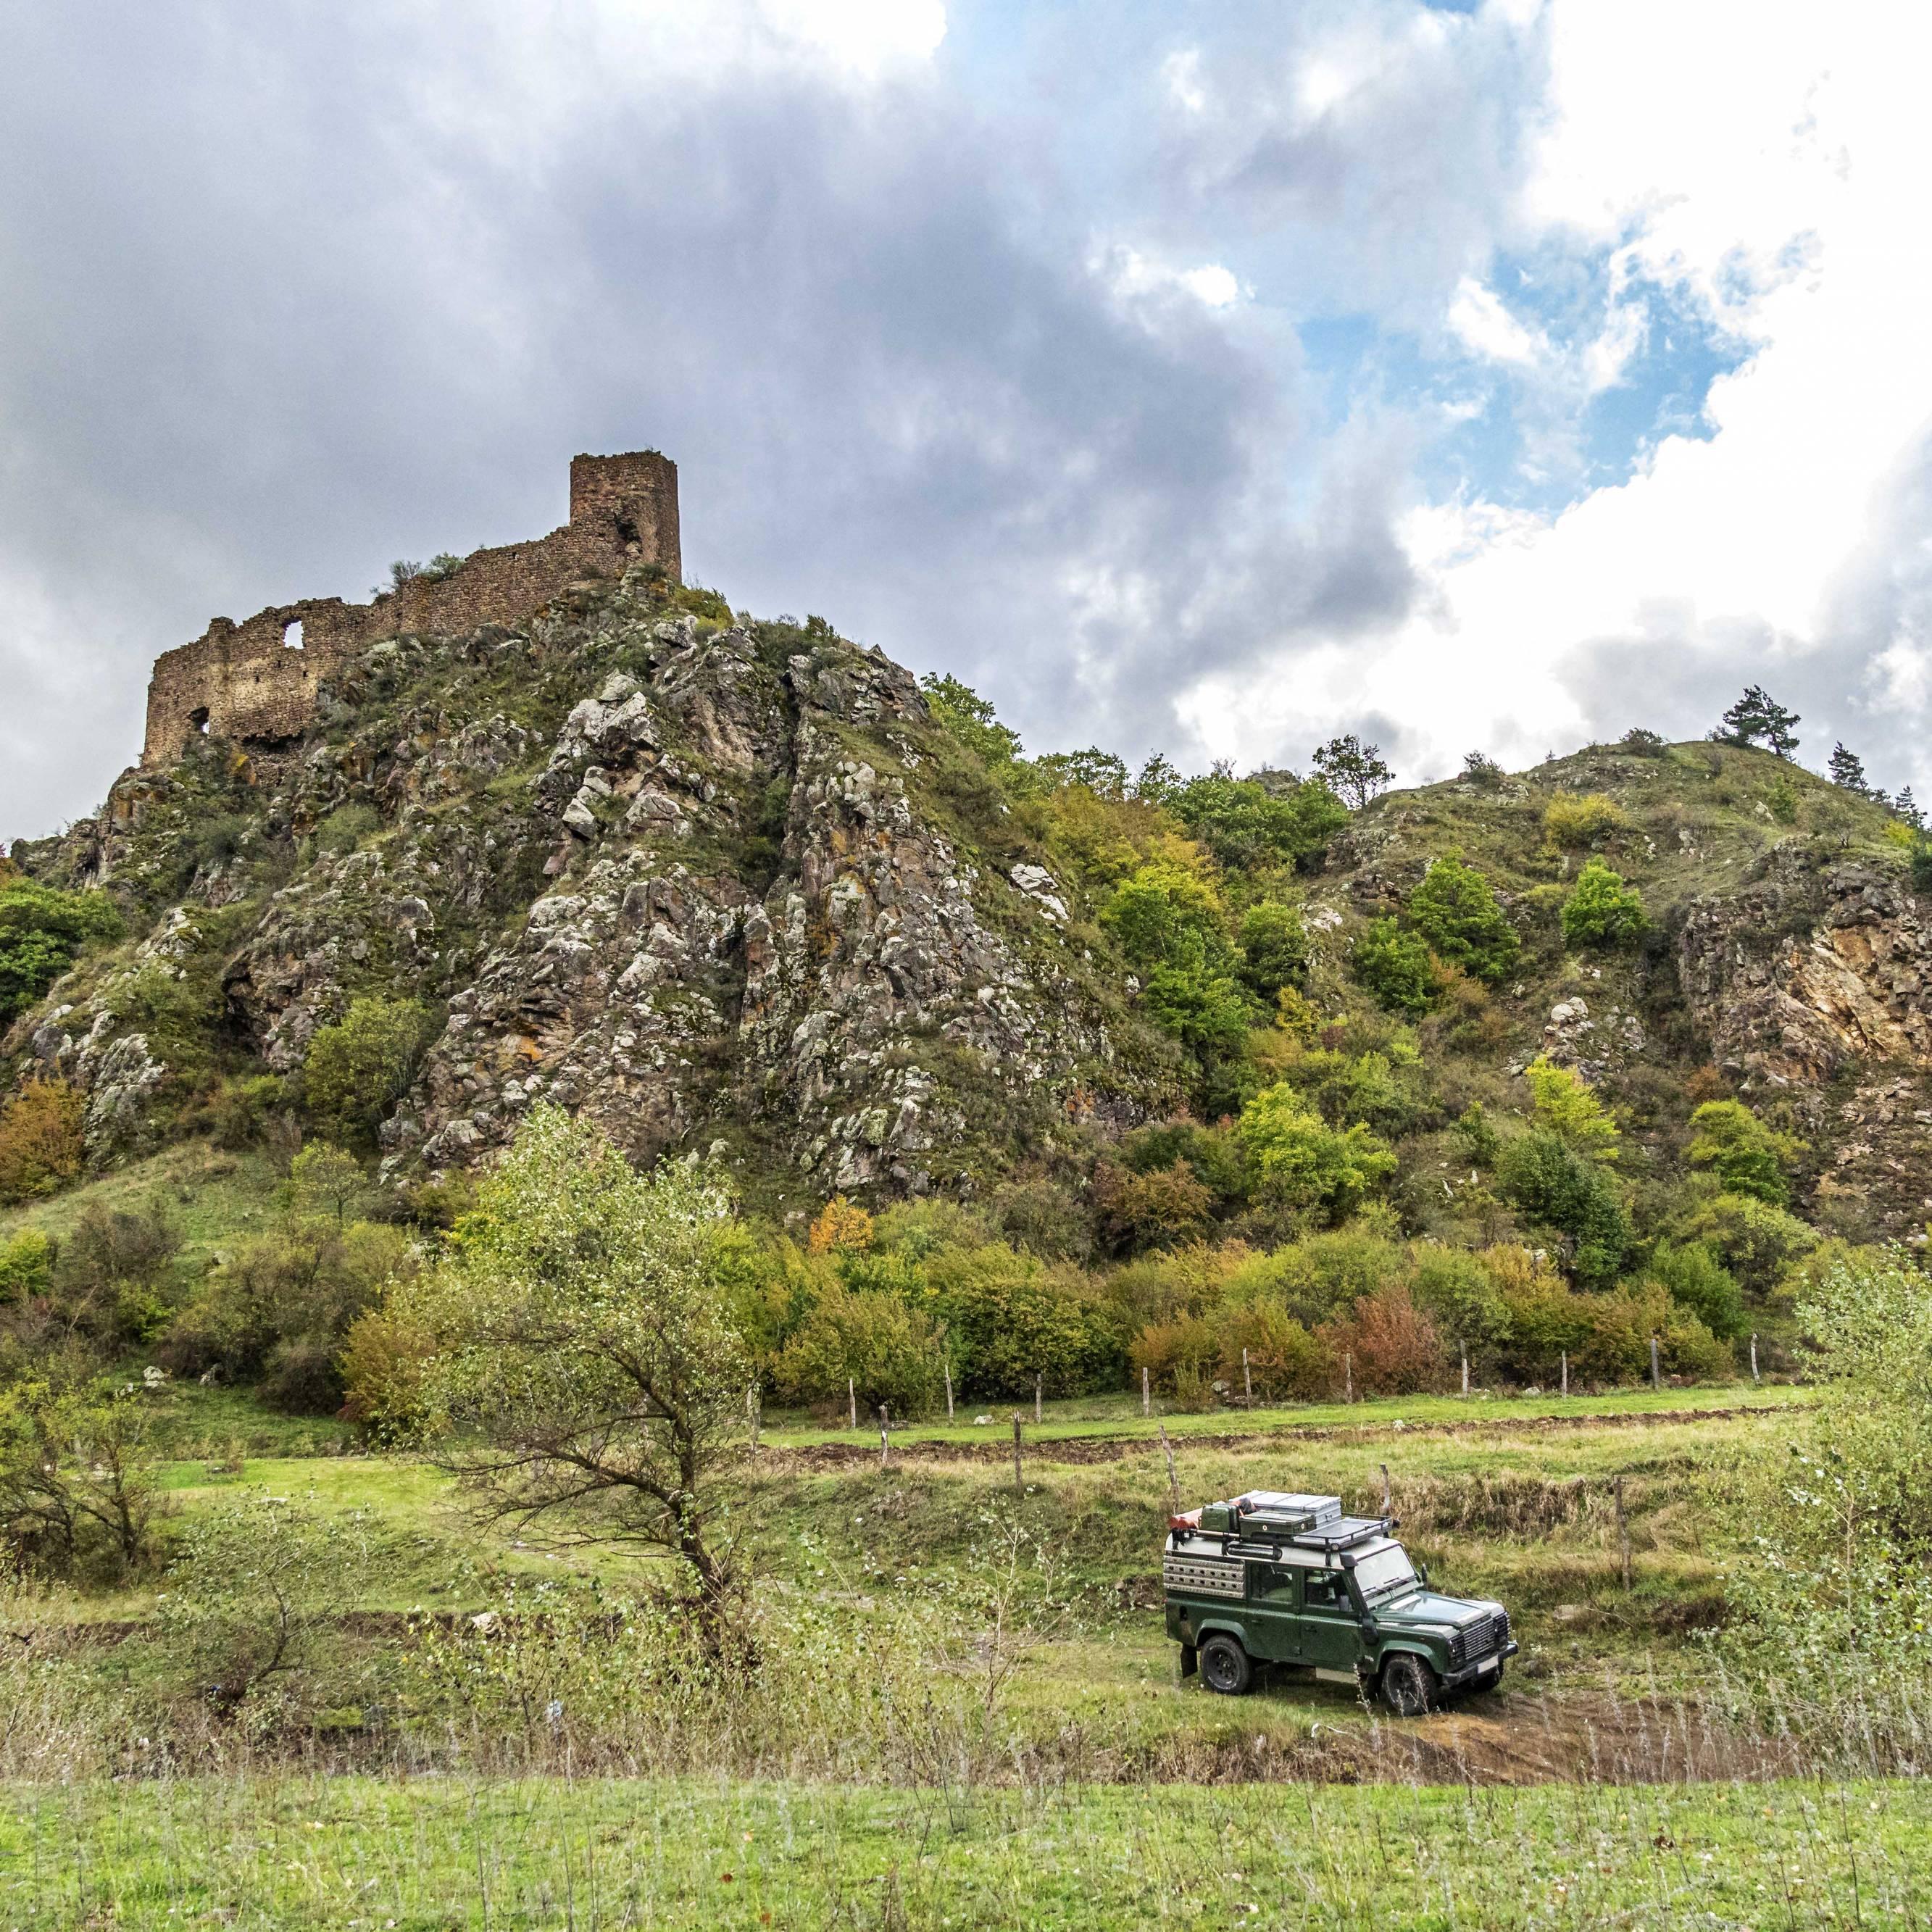 Camping spot in Javakheti